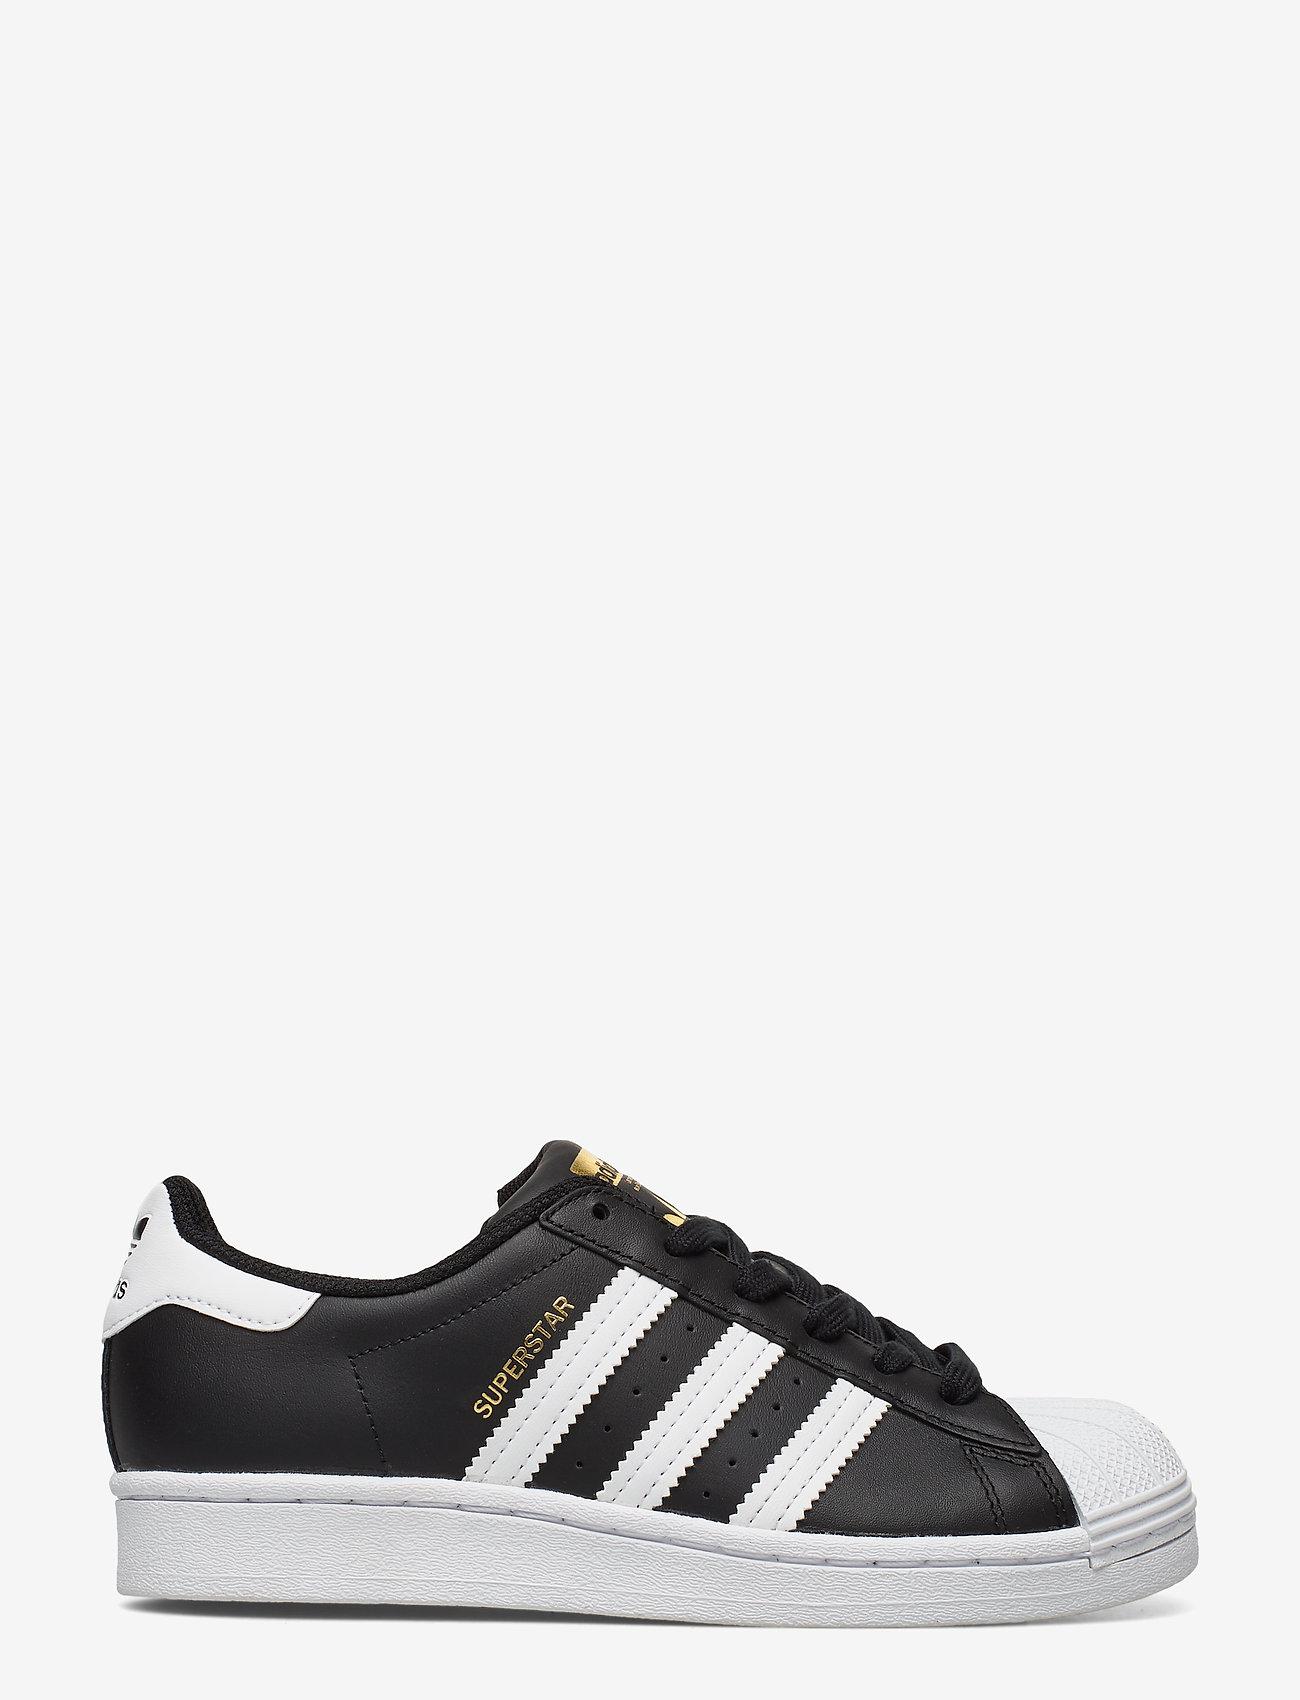 adidas Originals - Superstar W - sneakers - cblack/ftwwht/cblack - 1